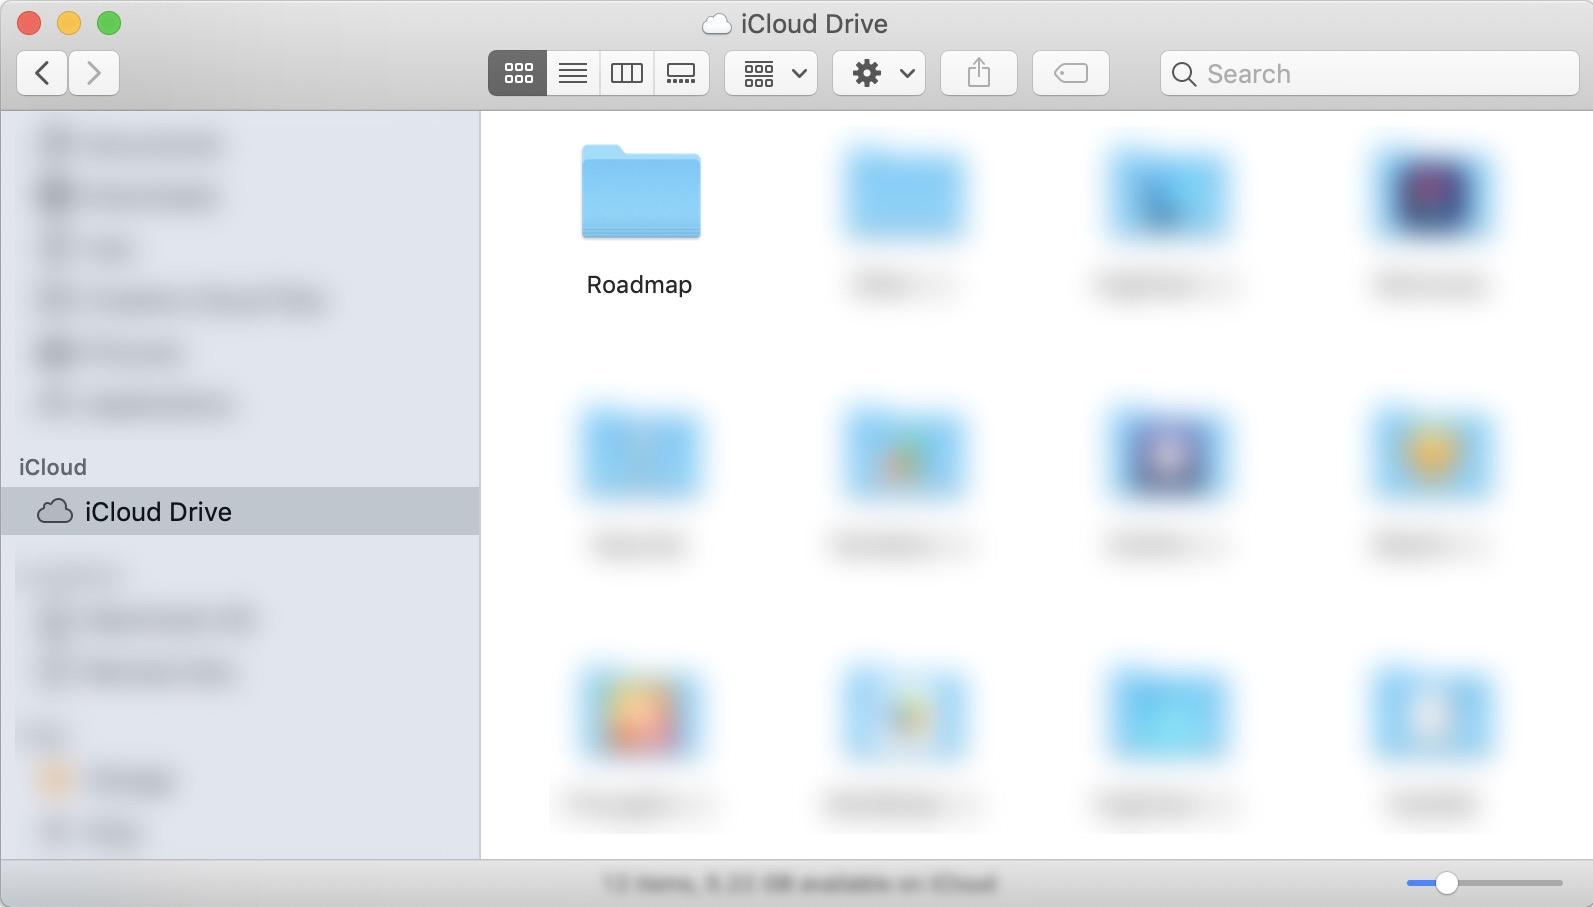 Synchorization via iCloud Drive | Roadmap for macOS